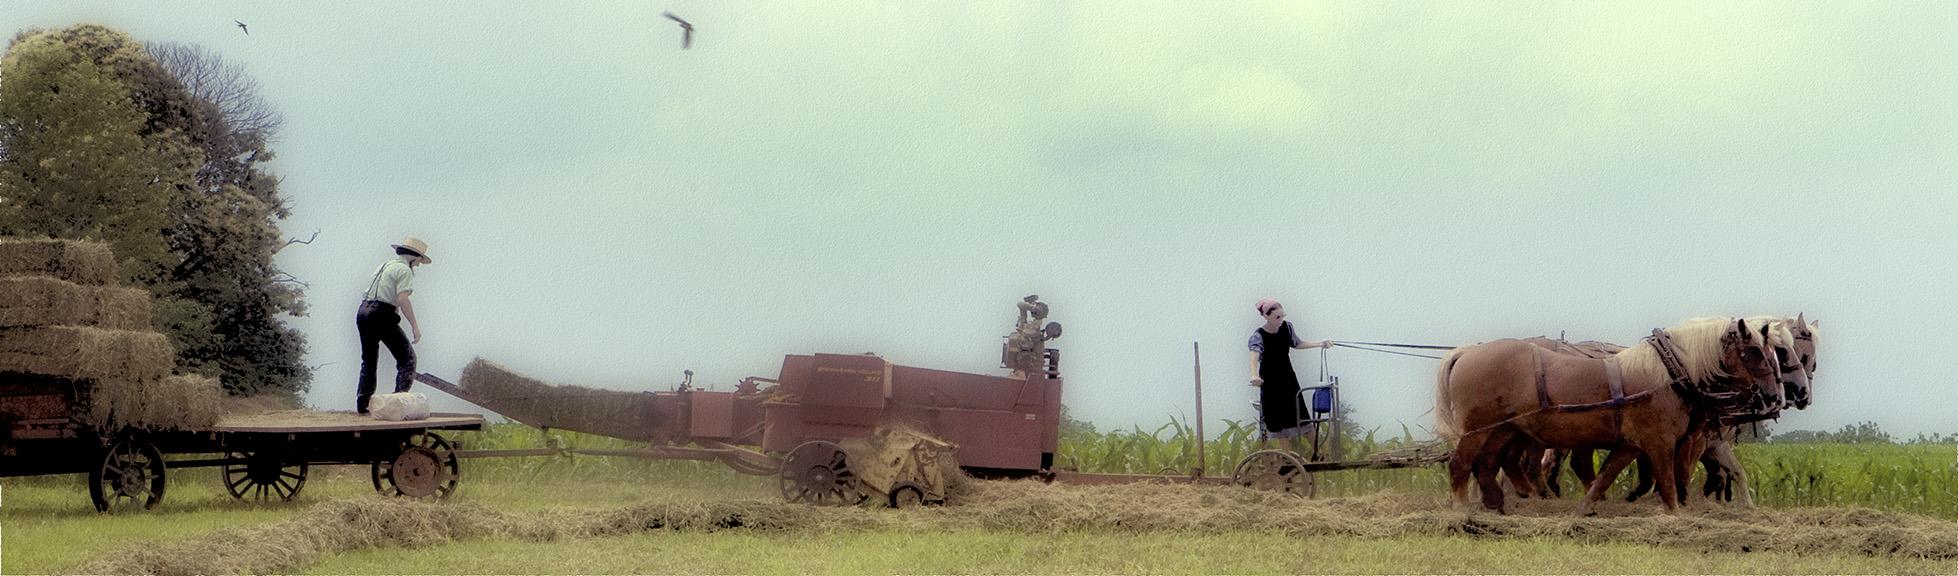 Hay Day II